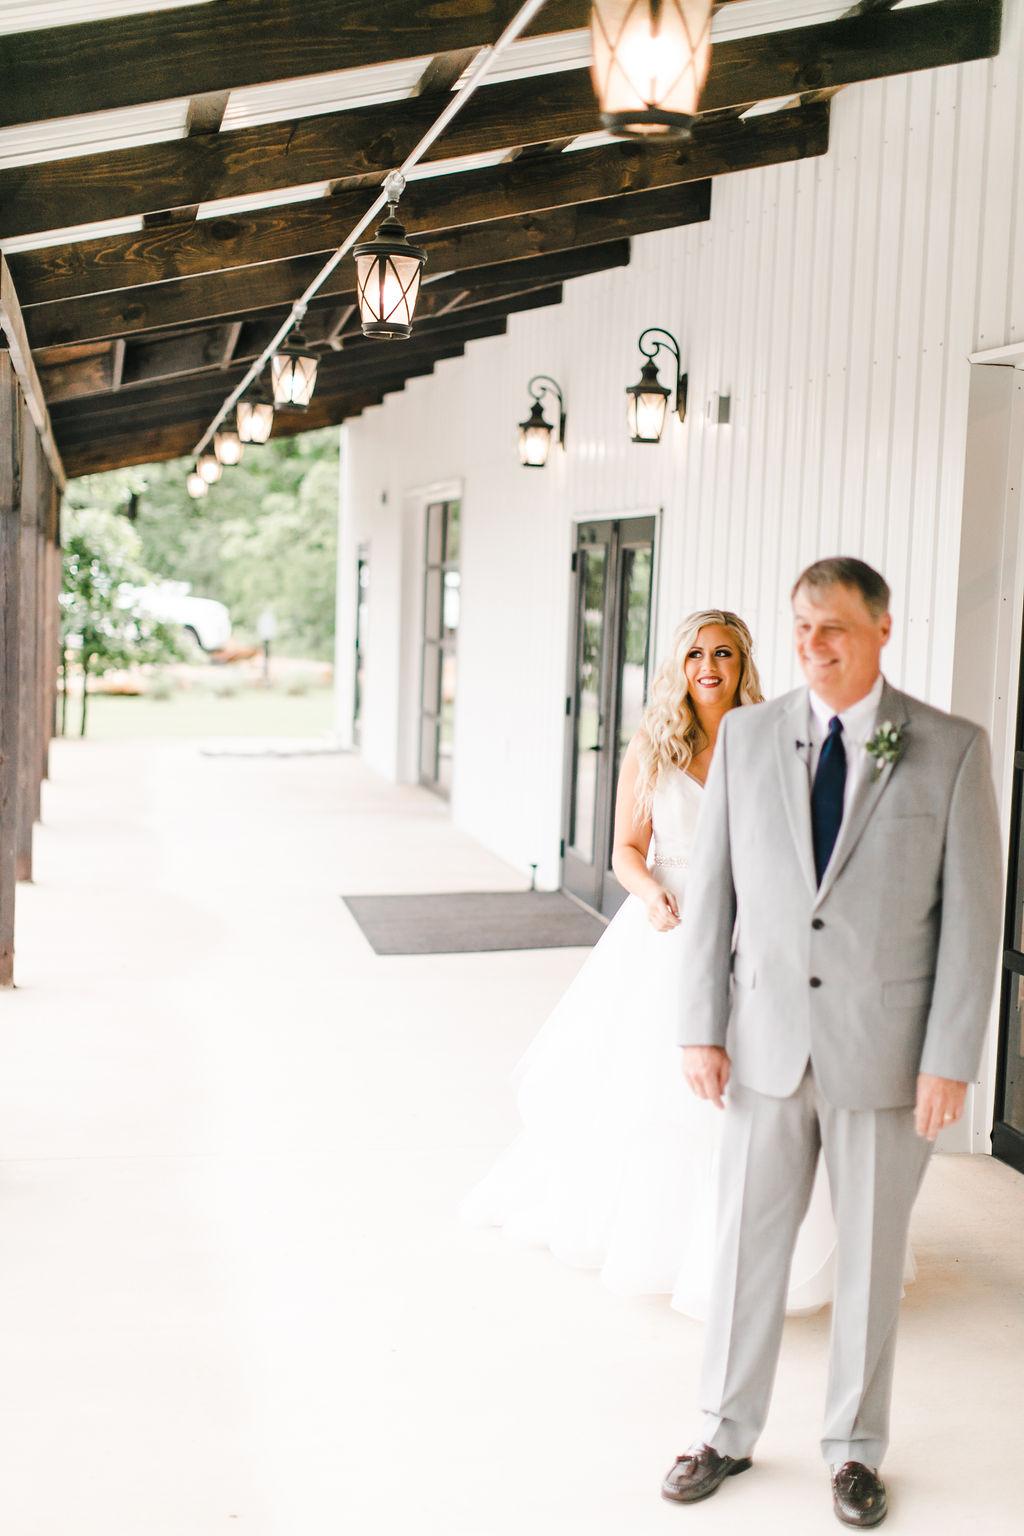 Dream Point Ranch Tulsa's White Barn Wedding Venue 39.jpg